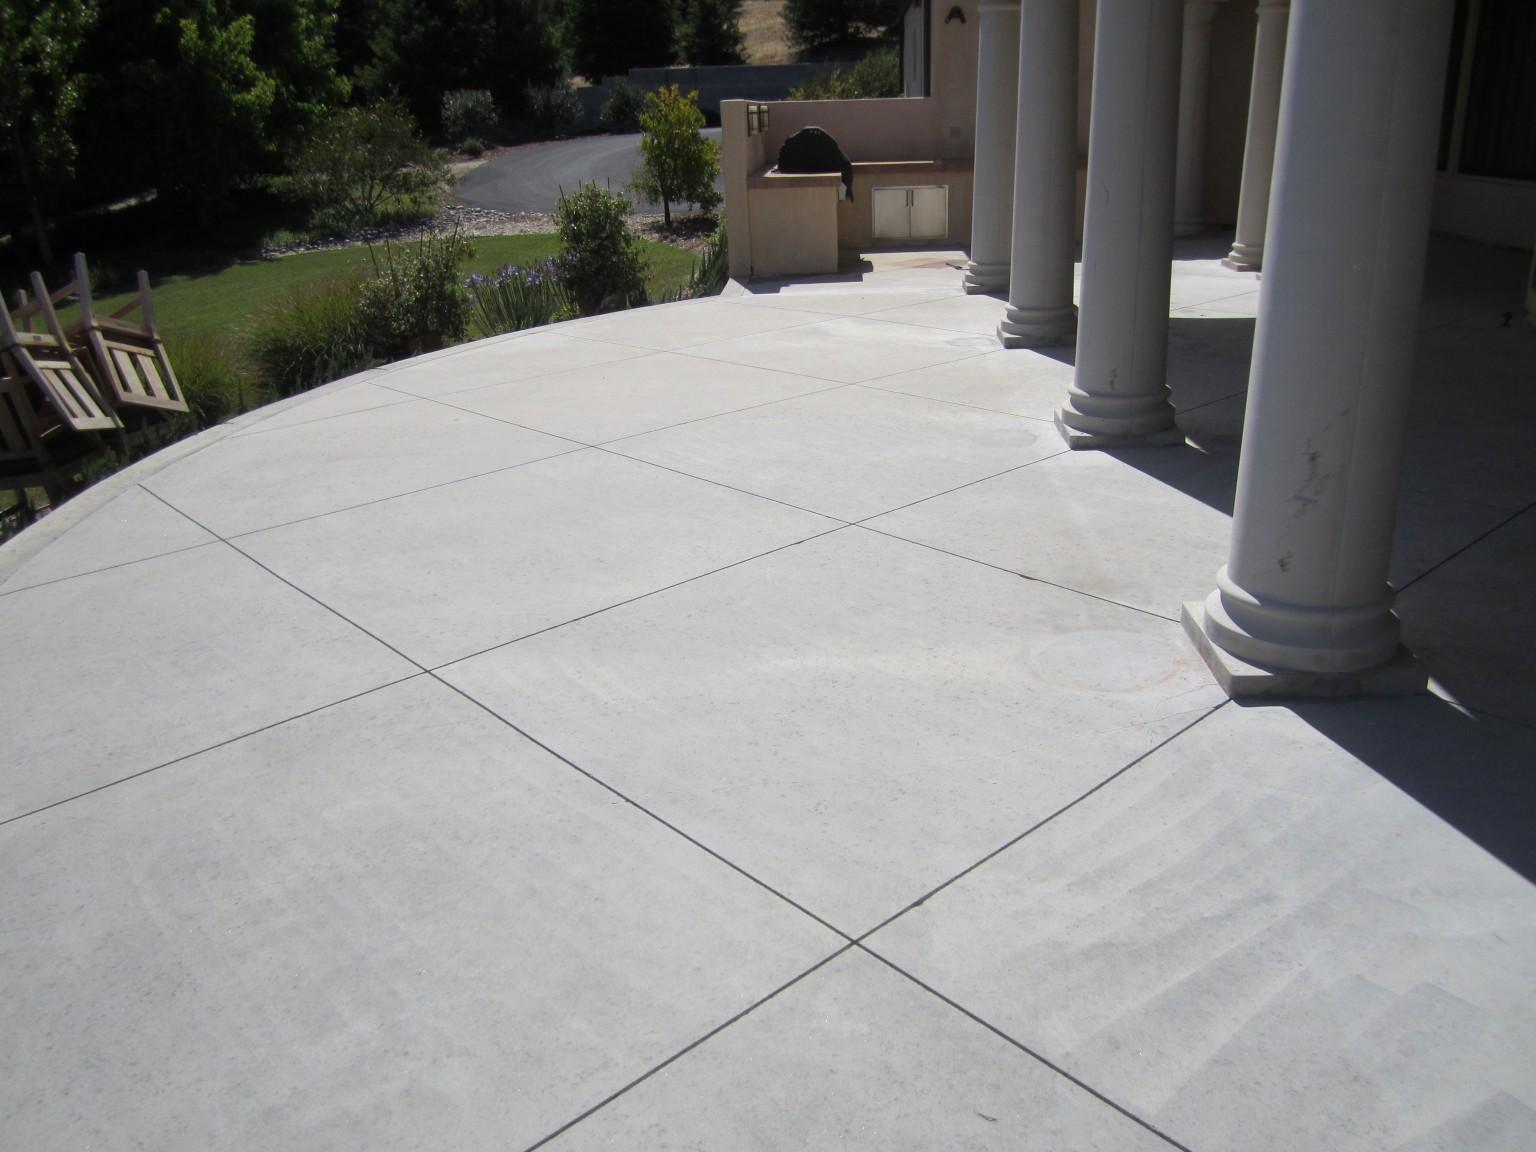 stained concrete concrete contractor